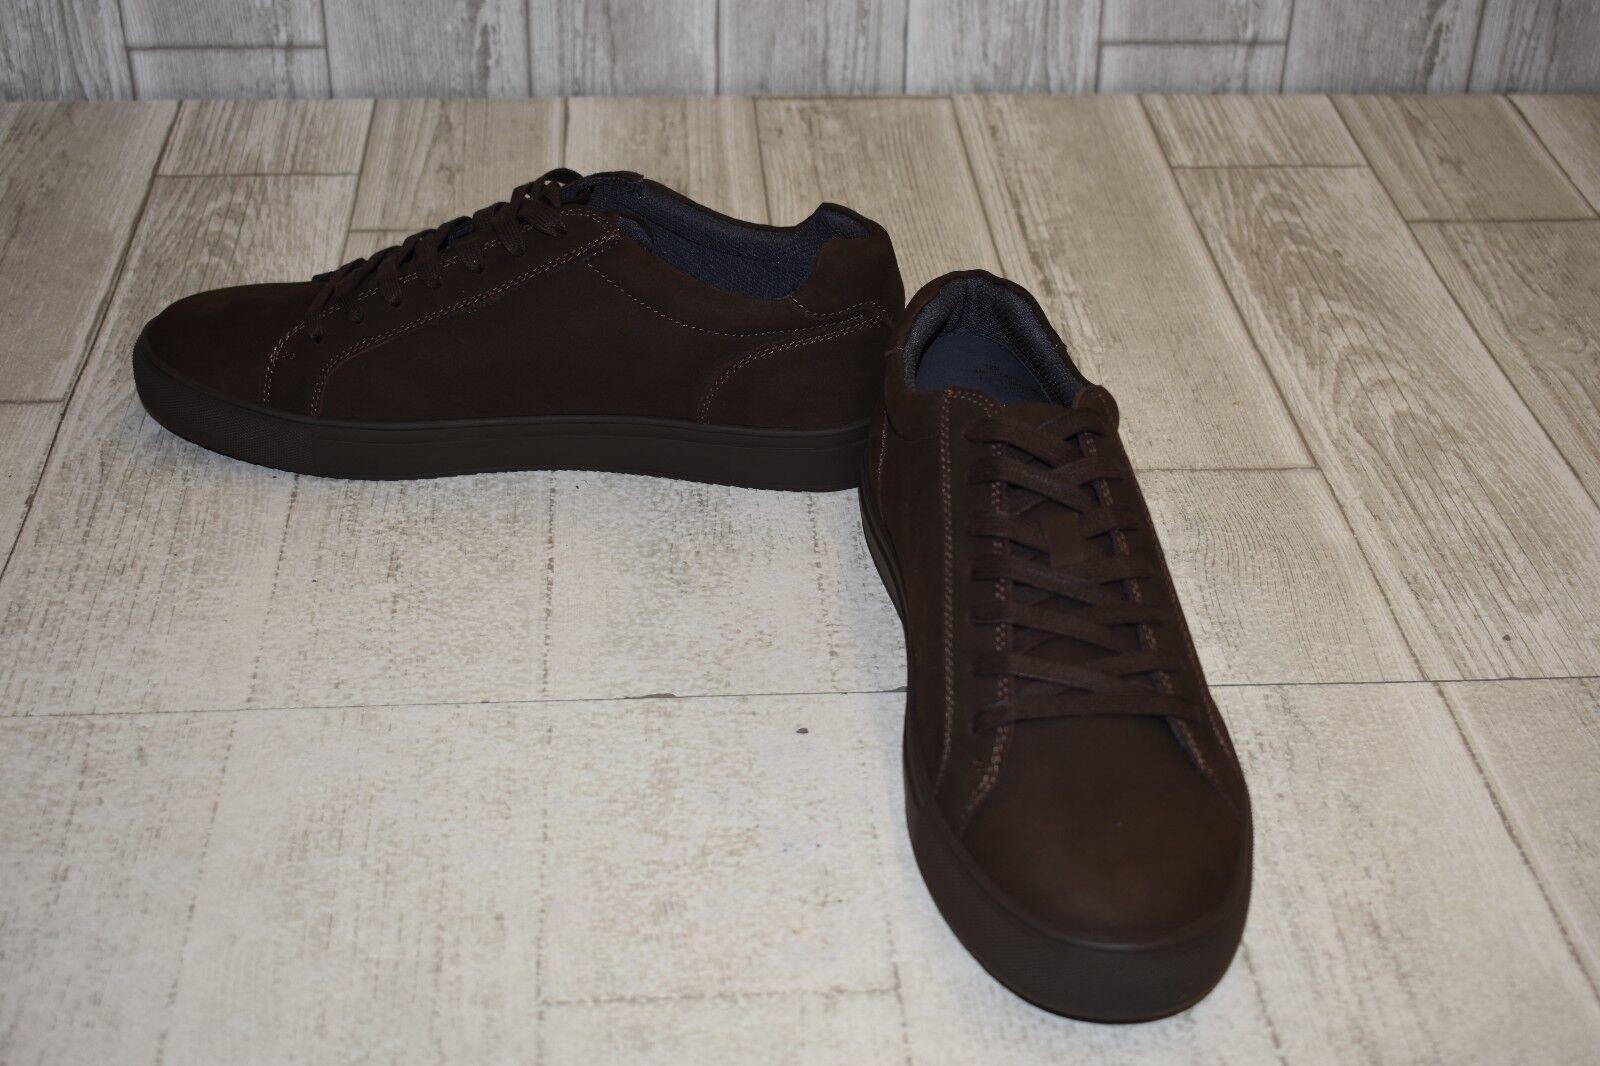 Dr. Scholl's Rhythms Casual Sneaker - Men's Size 12M, Brown